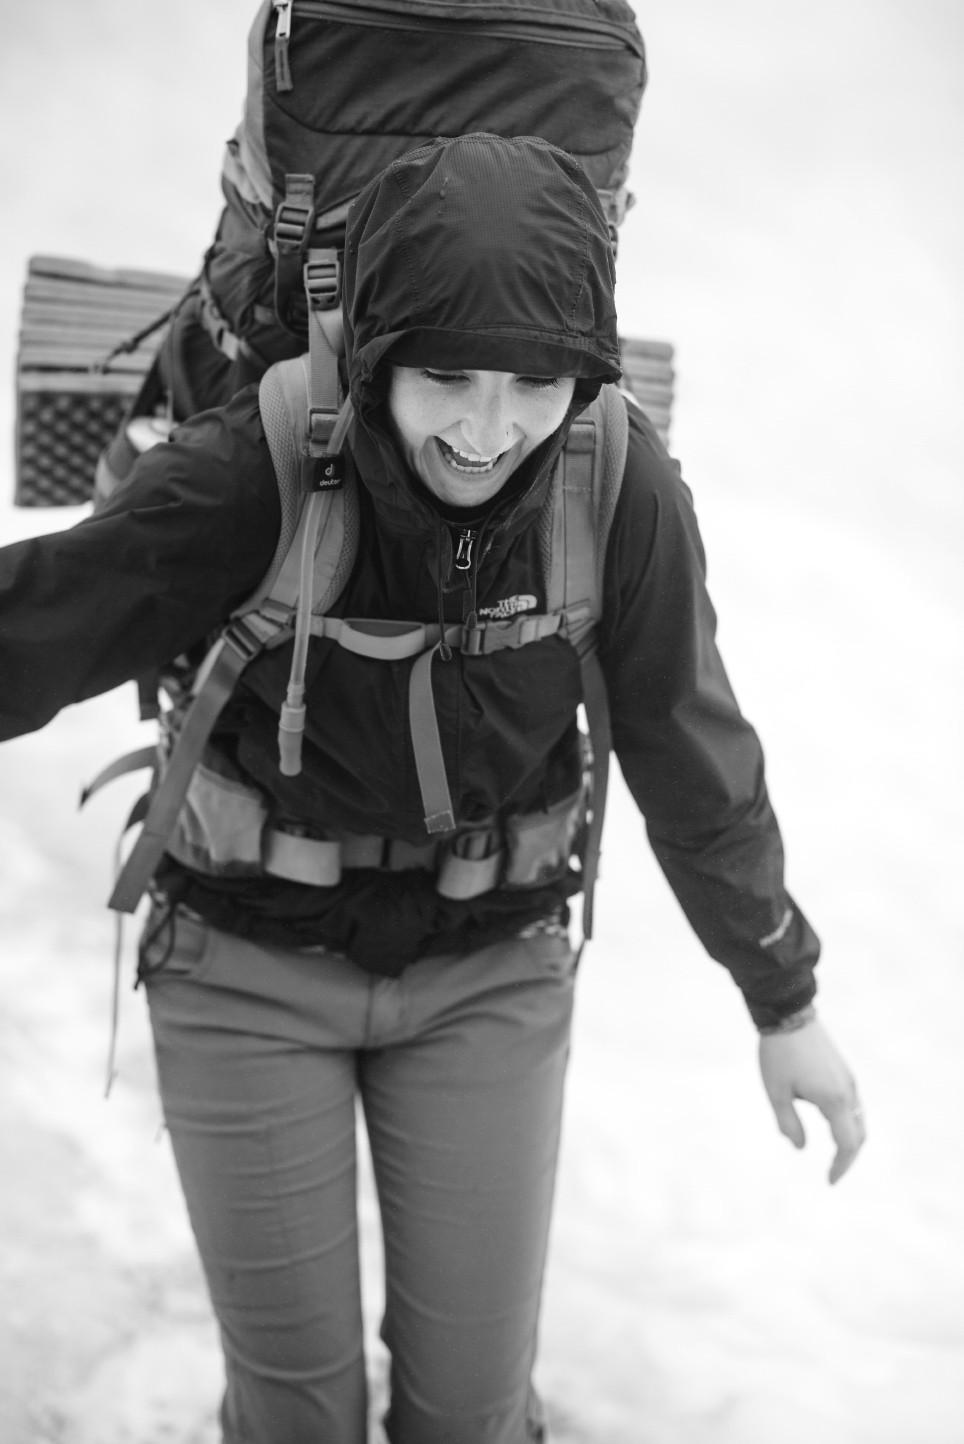 Morgan laughing on snowfield